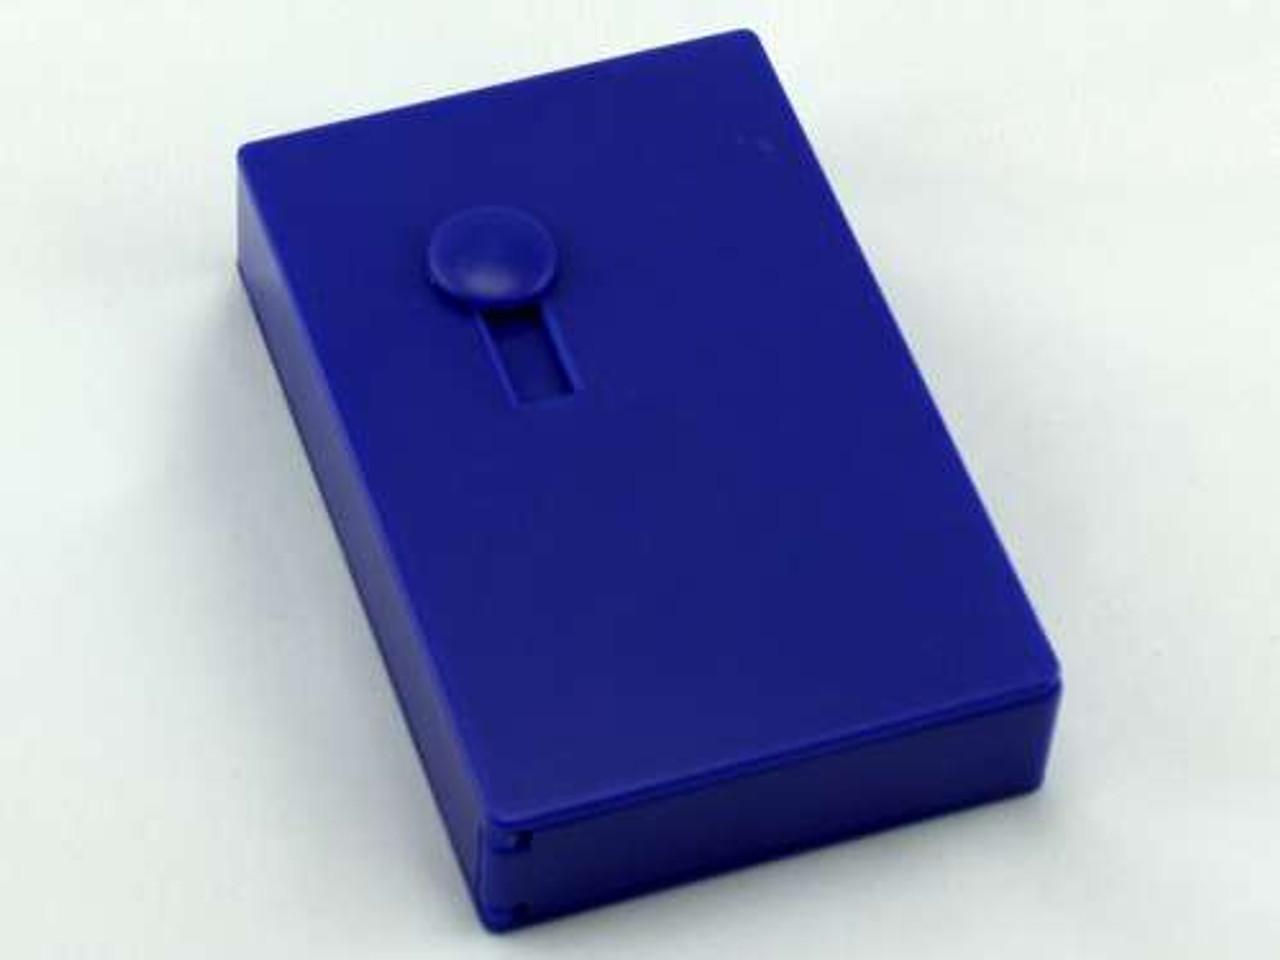 Blue Plastic Auto Dispensing Cigarette Case